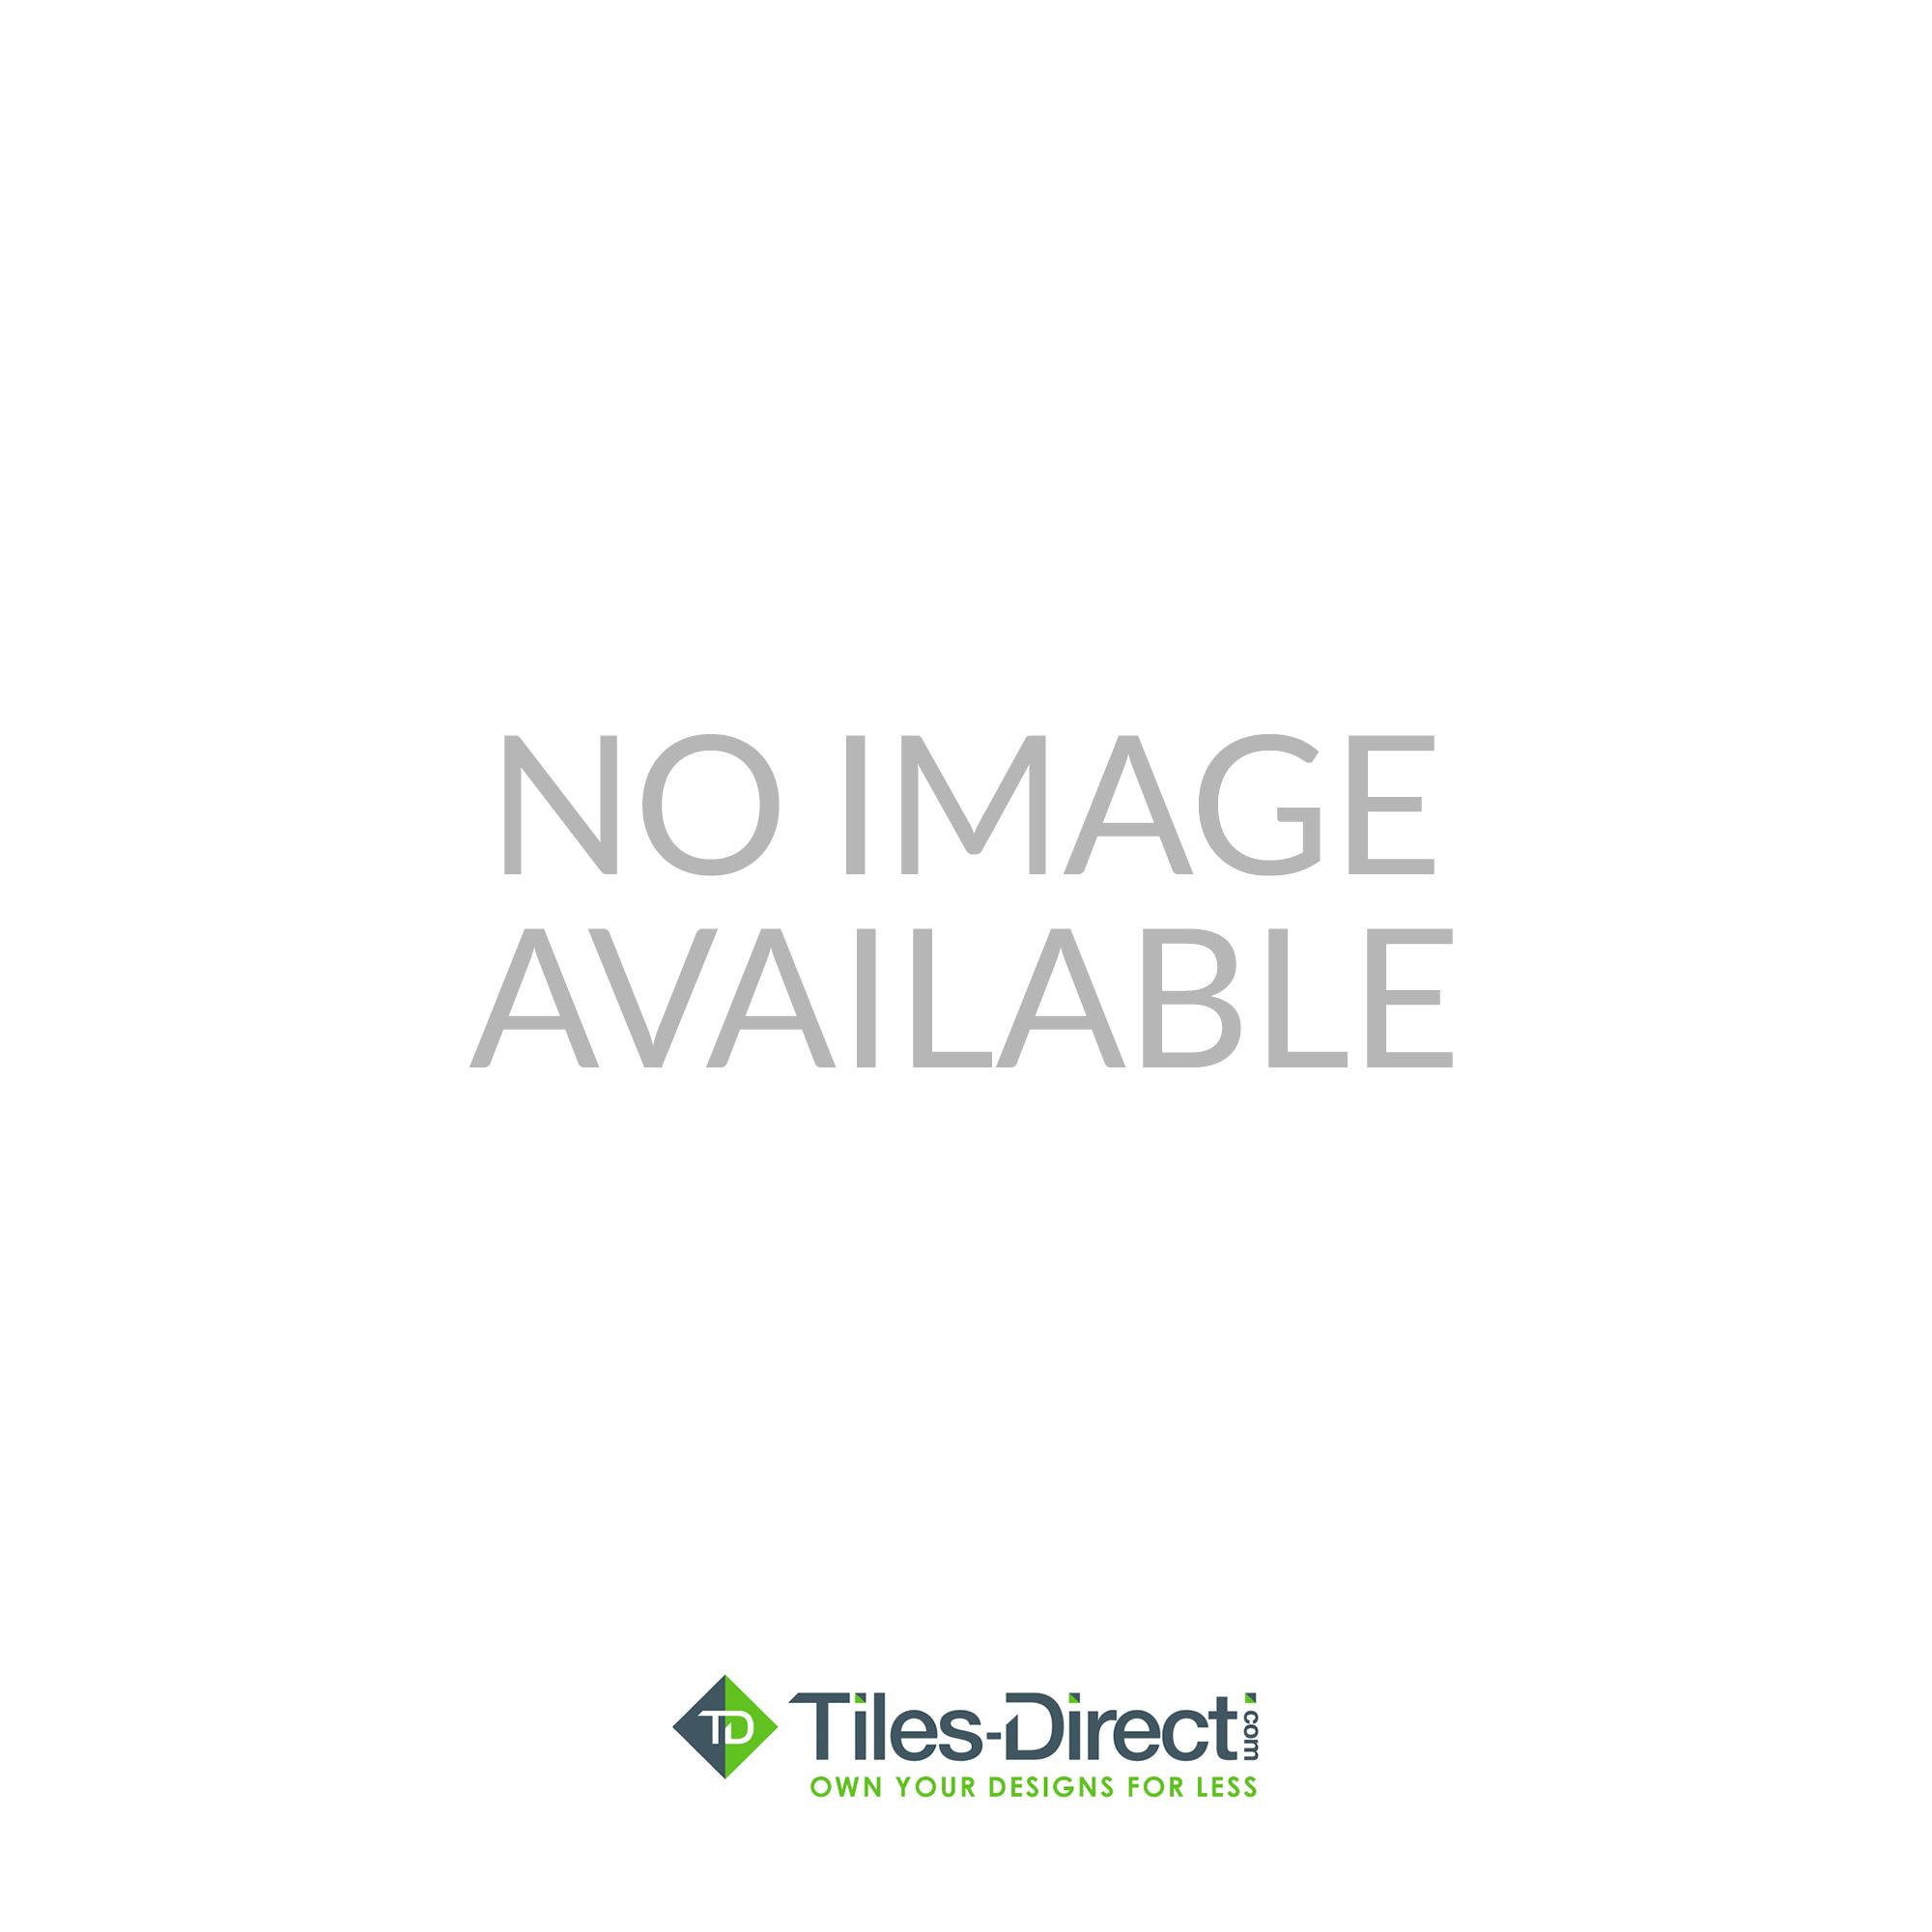 Tera 46cm x 68cm wall floor tile modular tera 46cm x 68cm wall floor tile dailygadgetfo Image collections